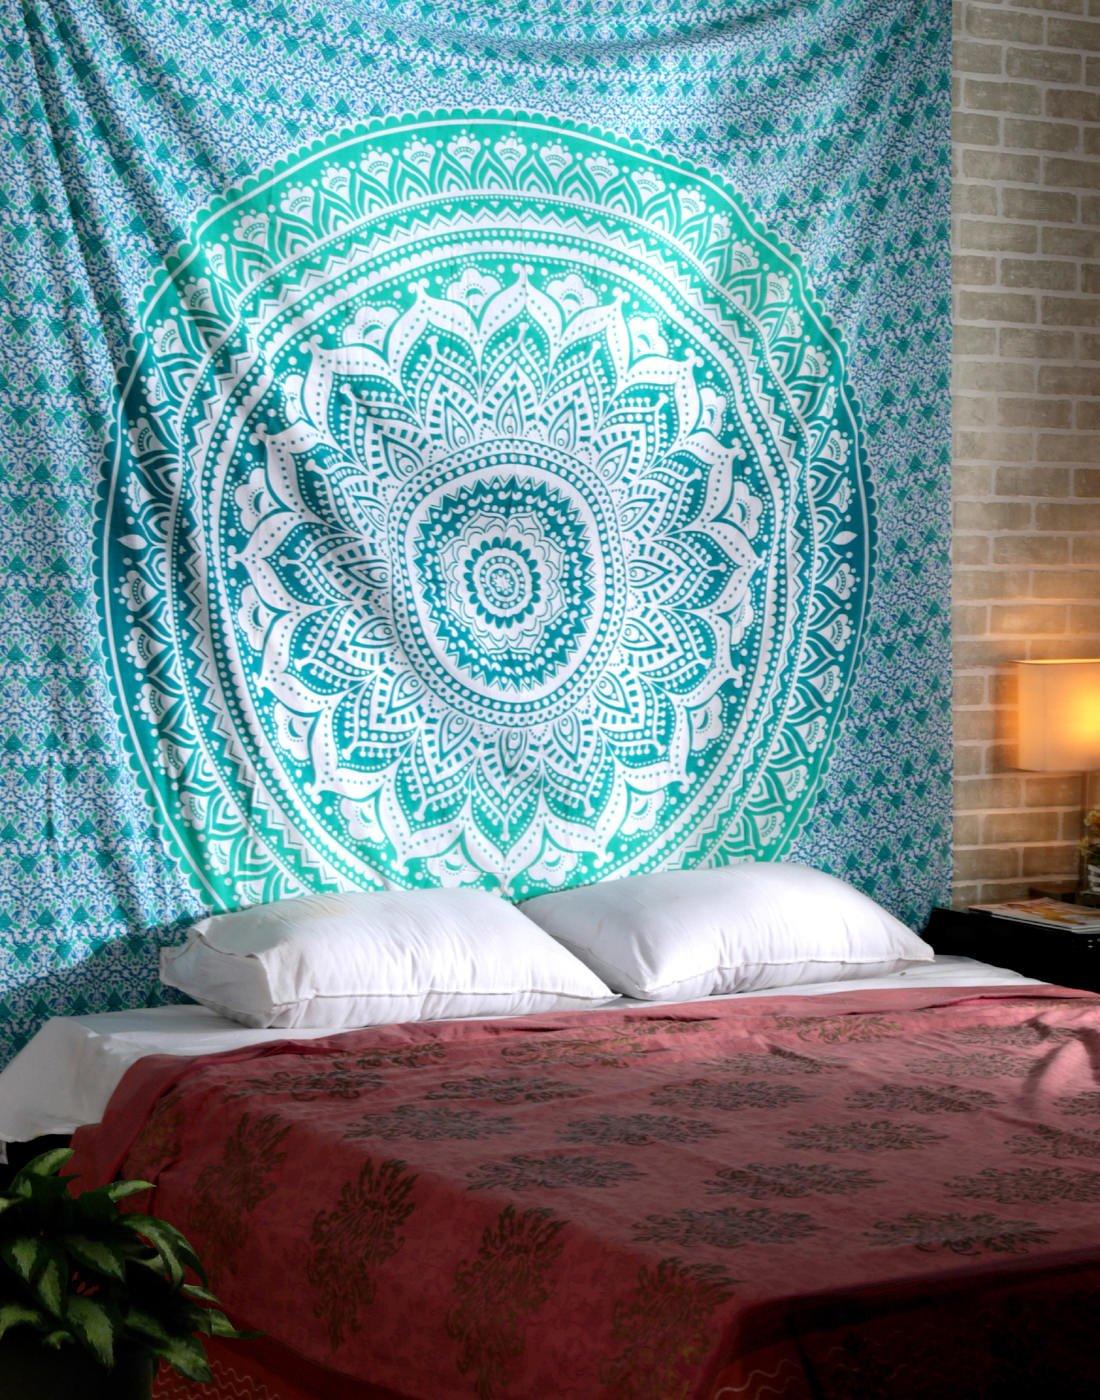 Amazoncom RAJRANG Turquoise Green Ombre Mandala Tapestry